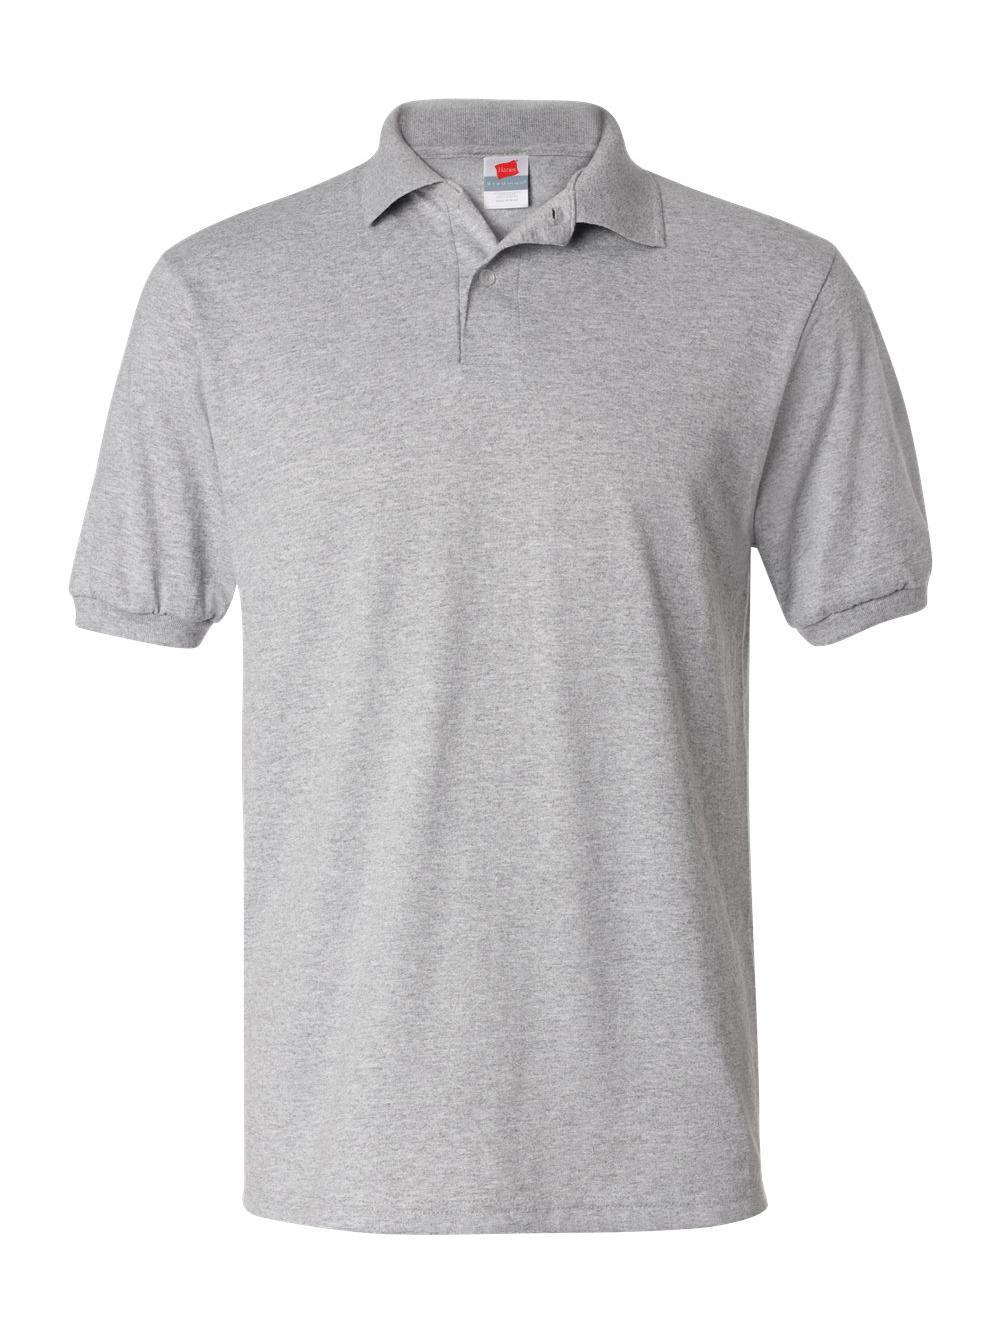 Hanes-Ecosmart-Jersey-Sport-Shirt-054X thumbnail 27